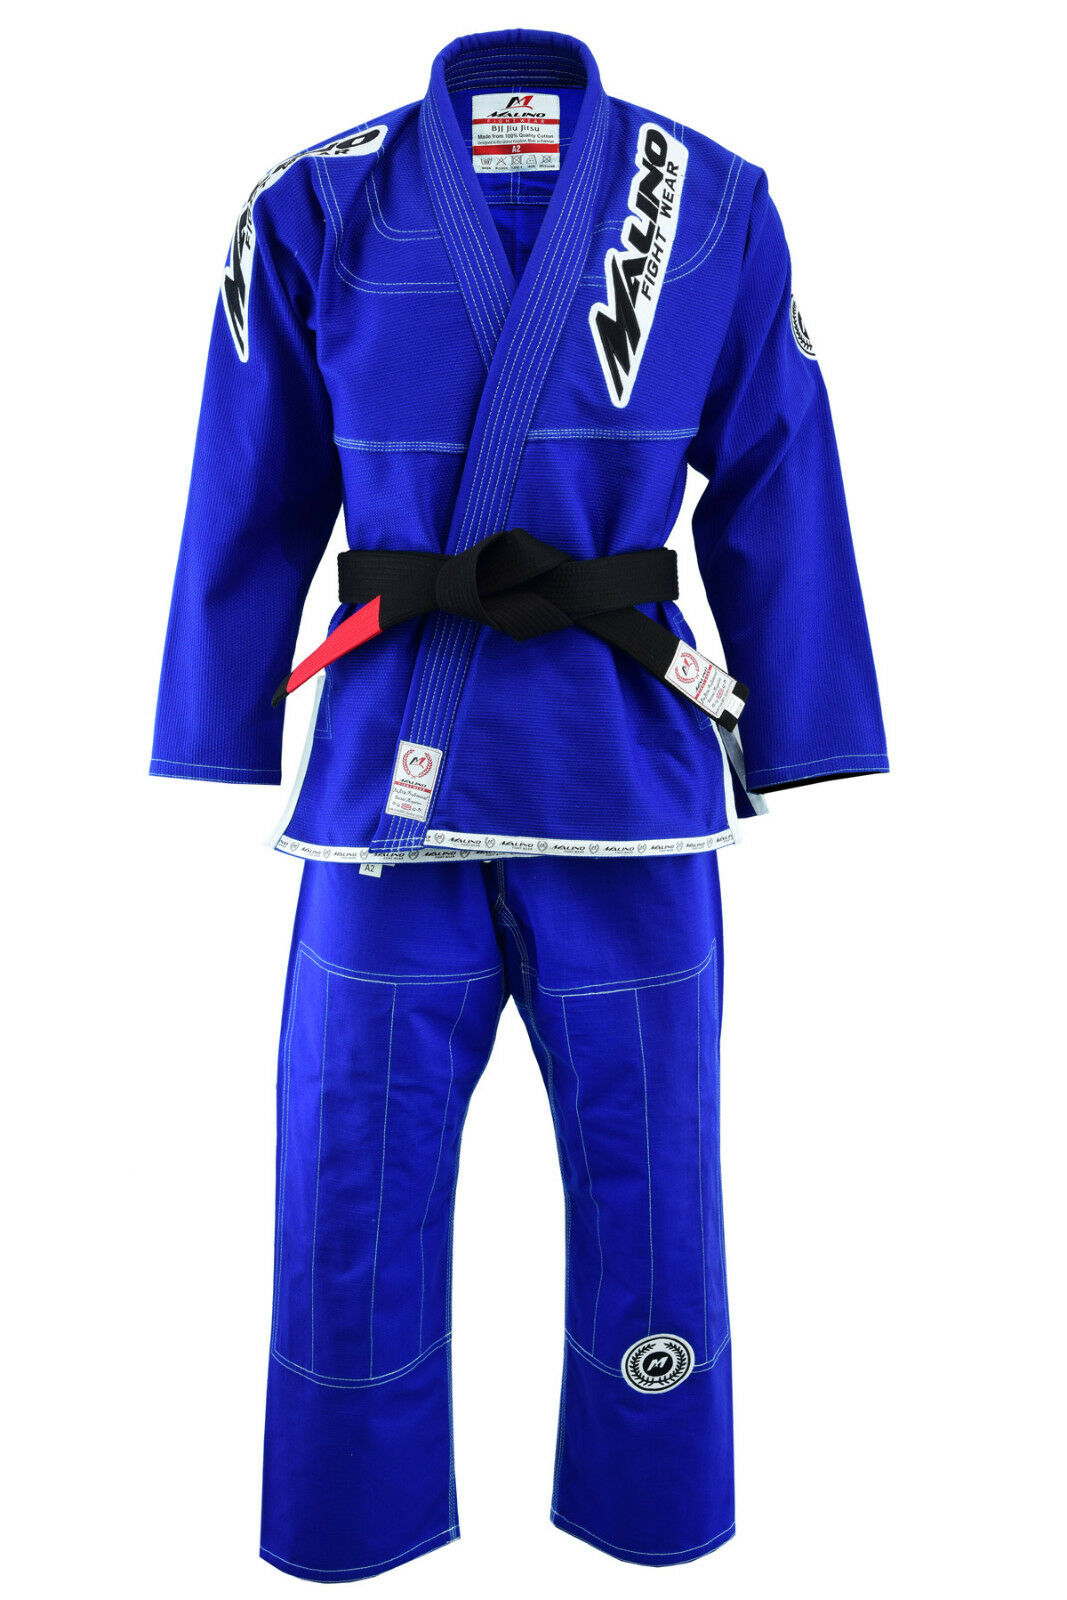 Malino BJJ Gi Suit Men Adult Uniform Brazilian Jiu Jitsu Kimono bluee 450Gsm